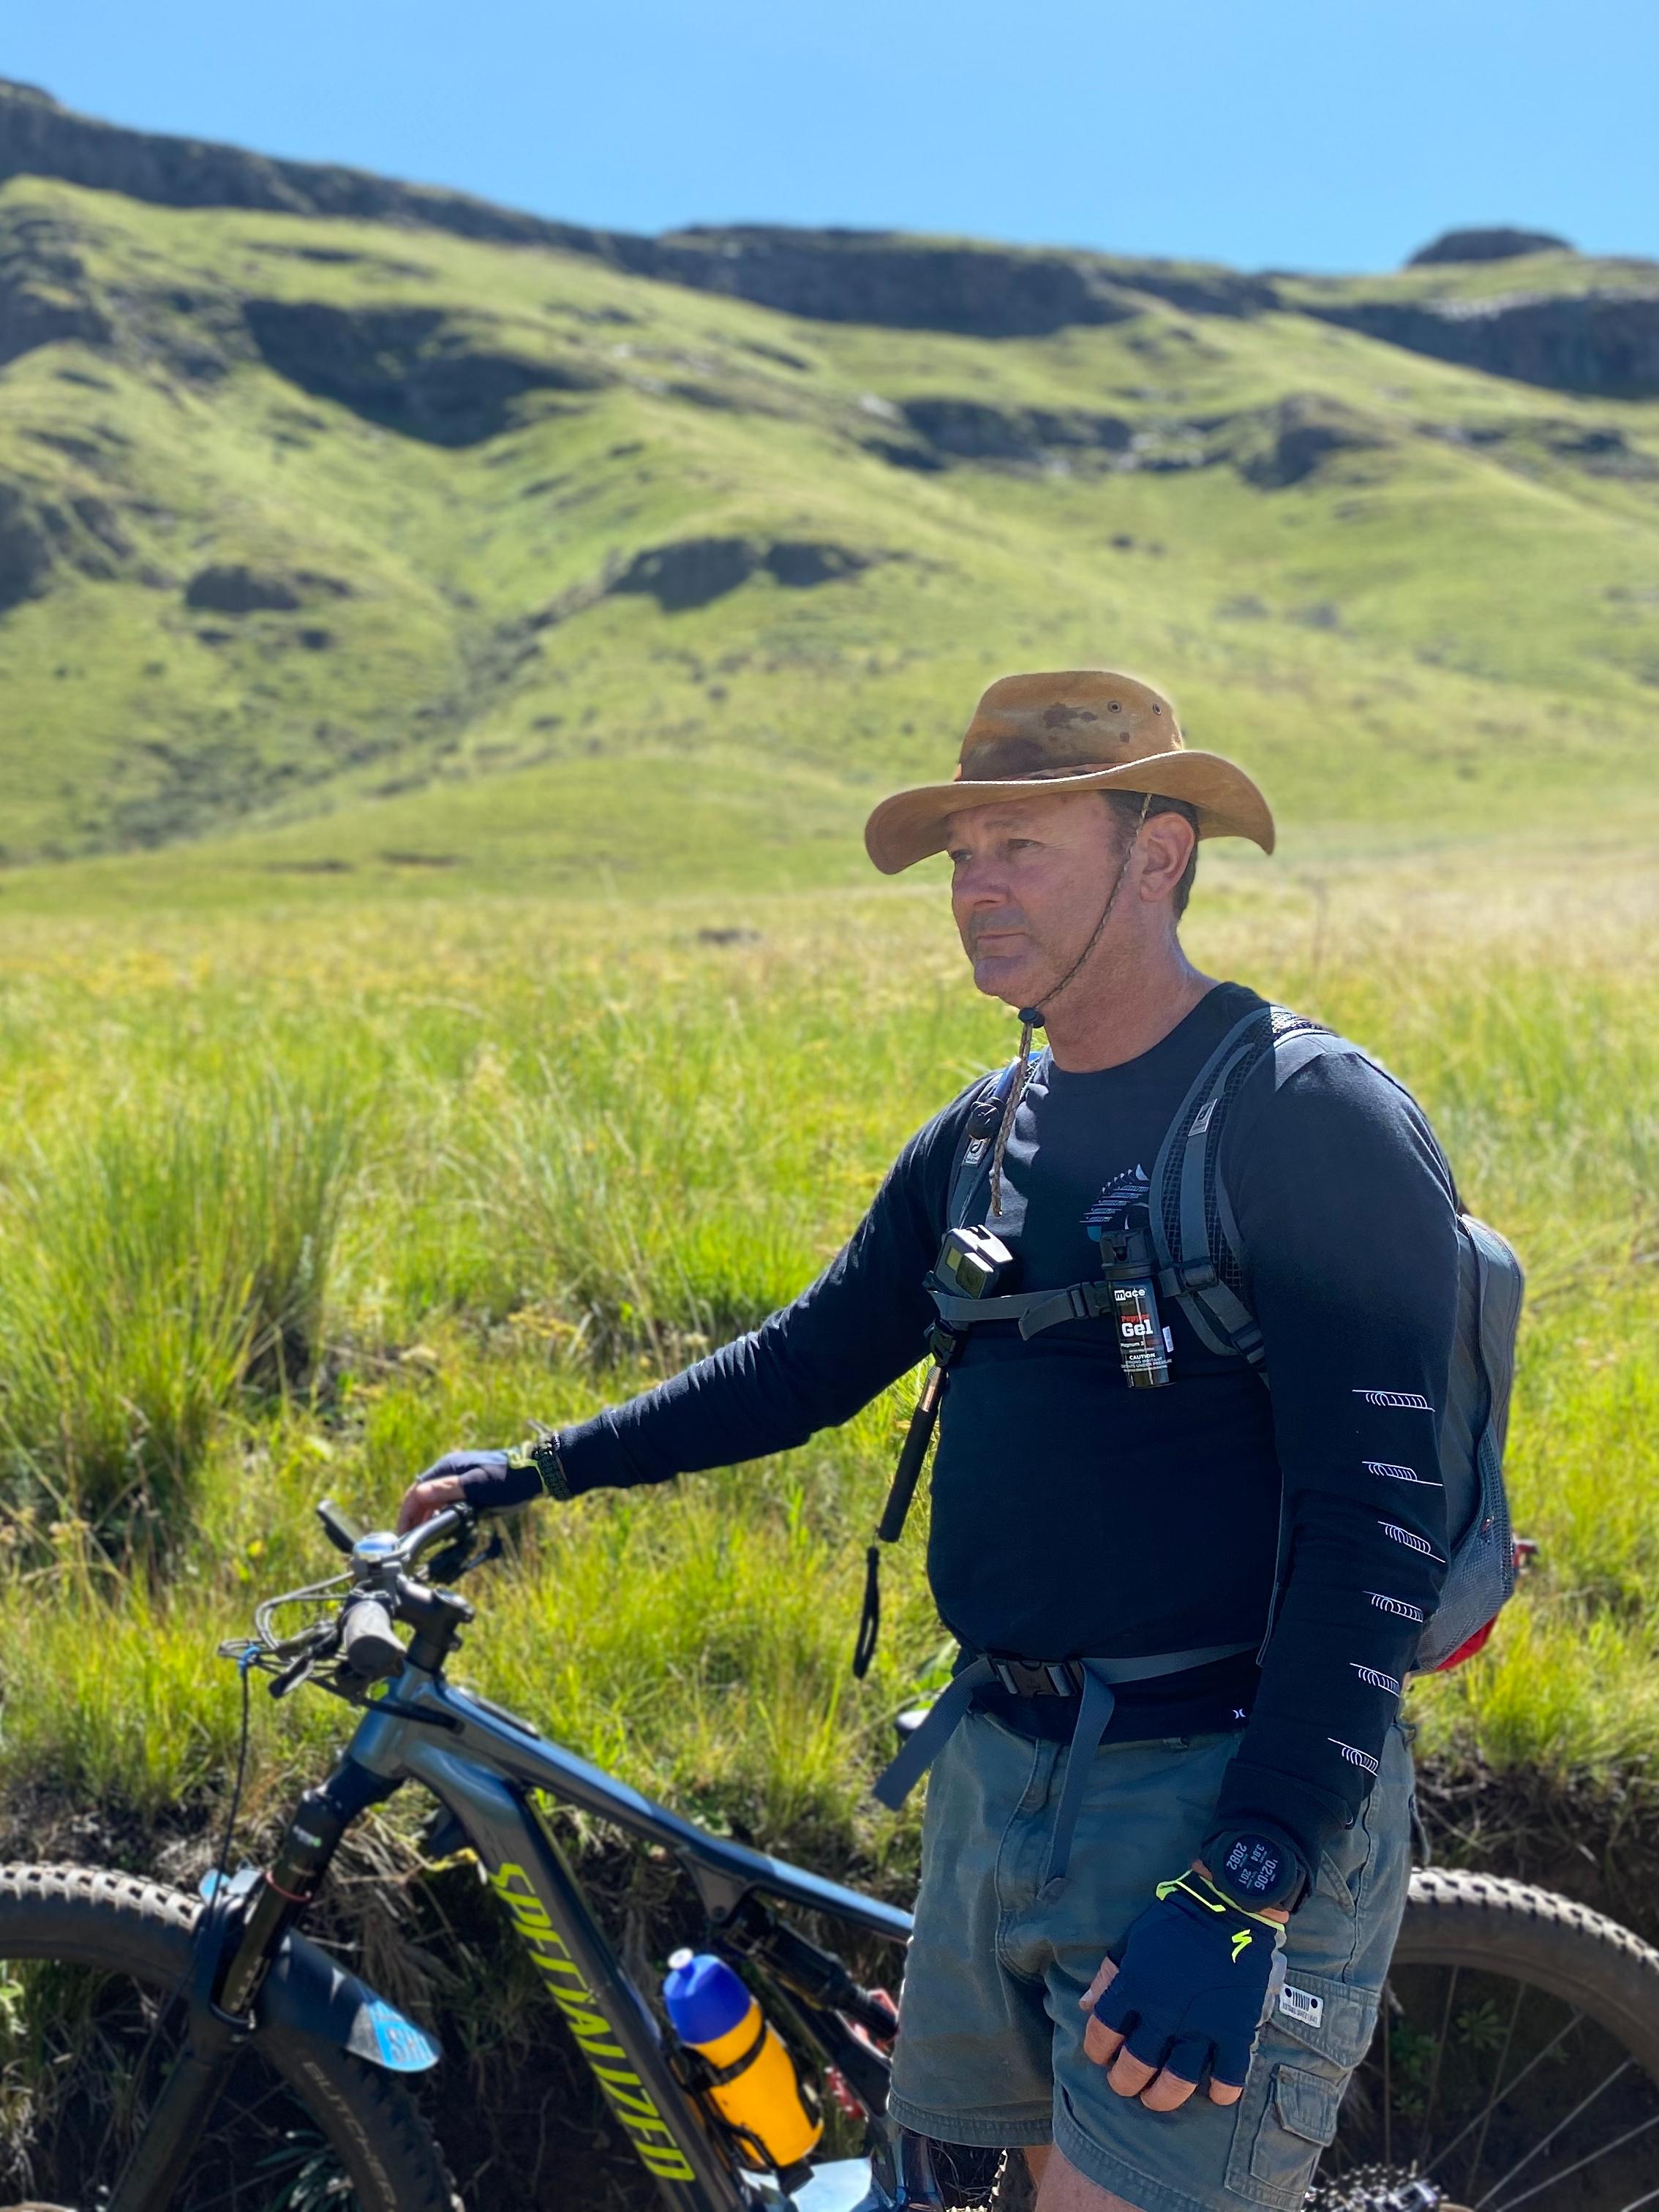 Cautand Bike Bike.)